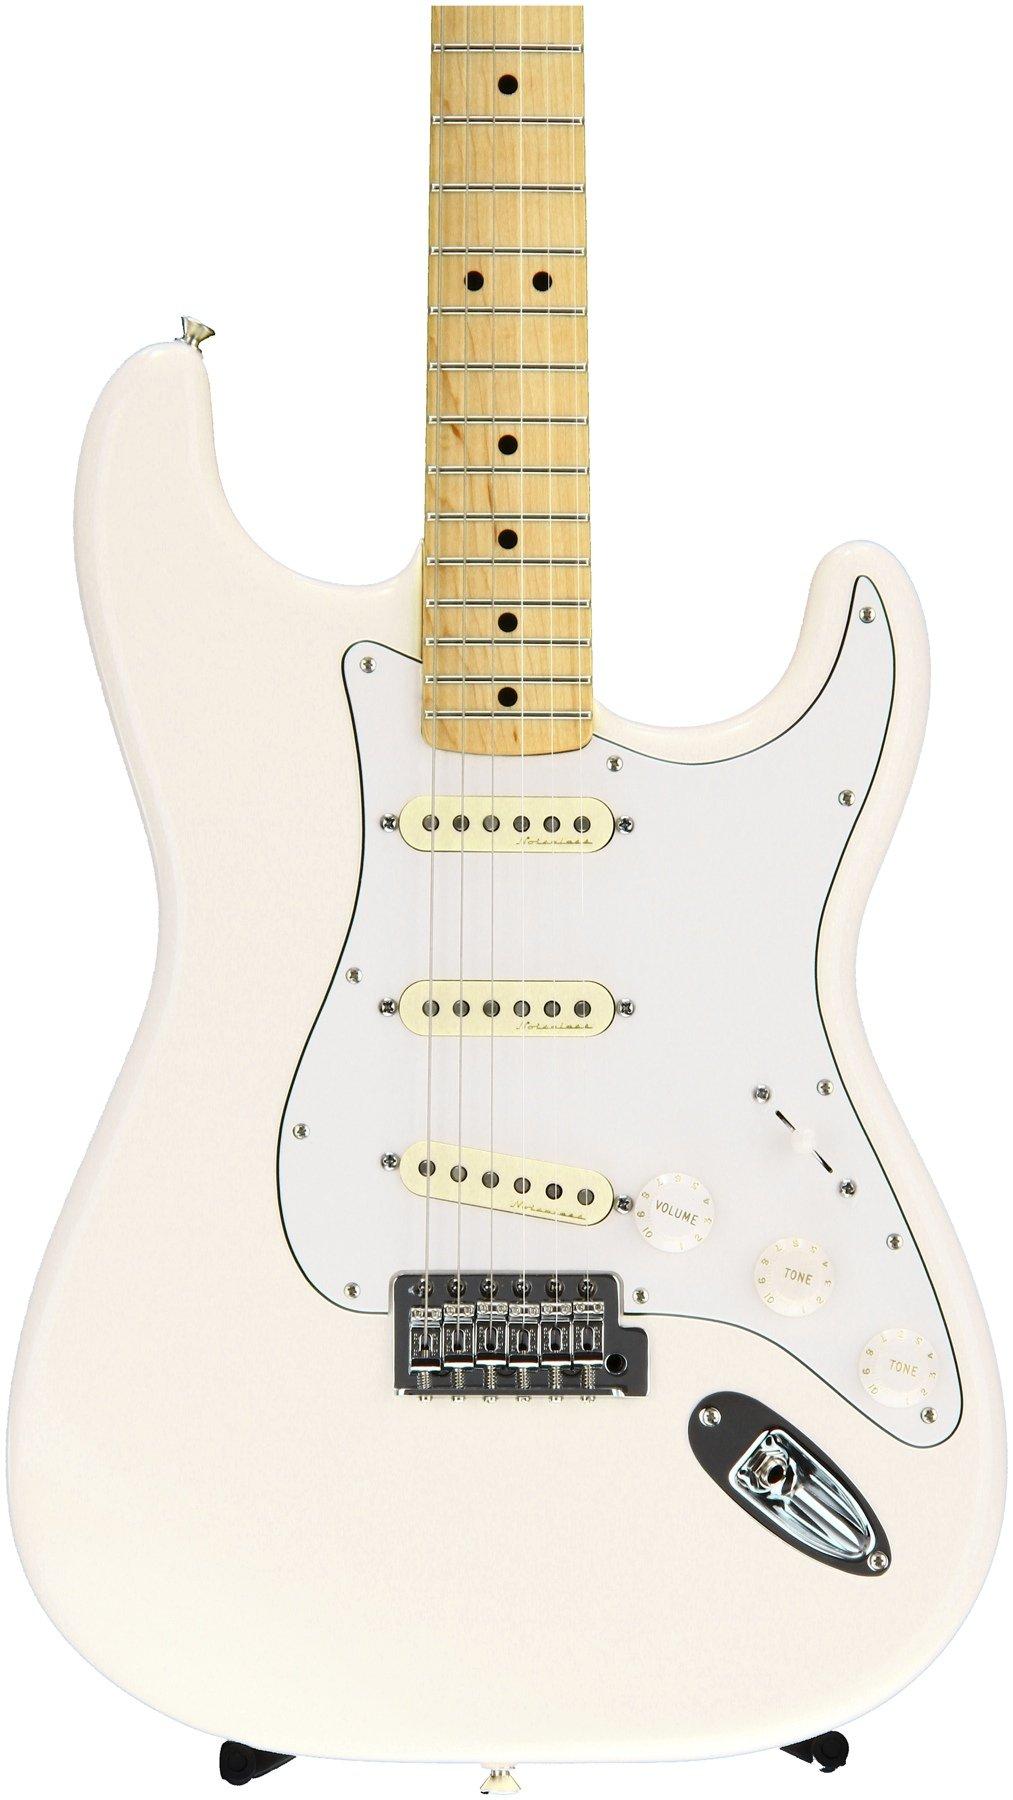 Fender Vintage Noiseless Strat Pickups Accessories >> Fender Standard Stratocaster With Vintage Noiseless Pickups Arctic